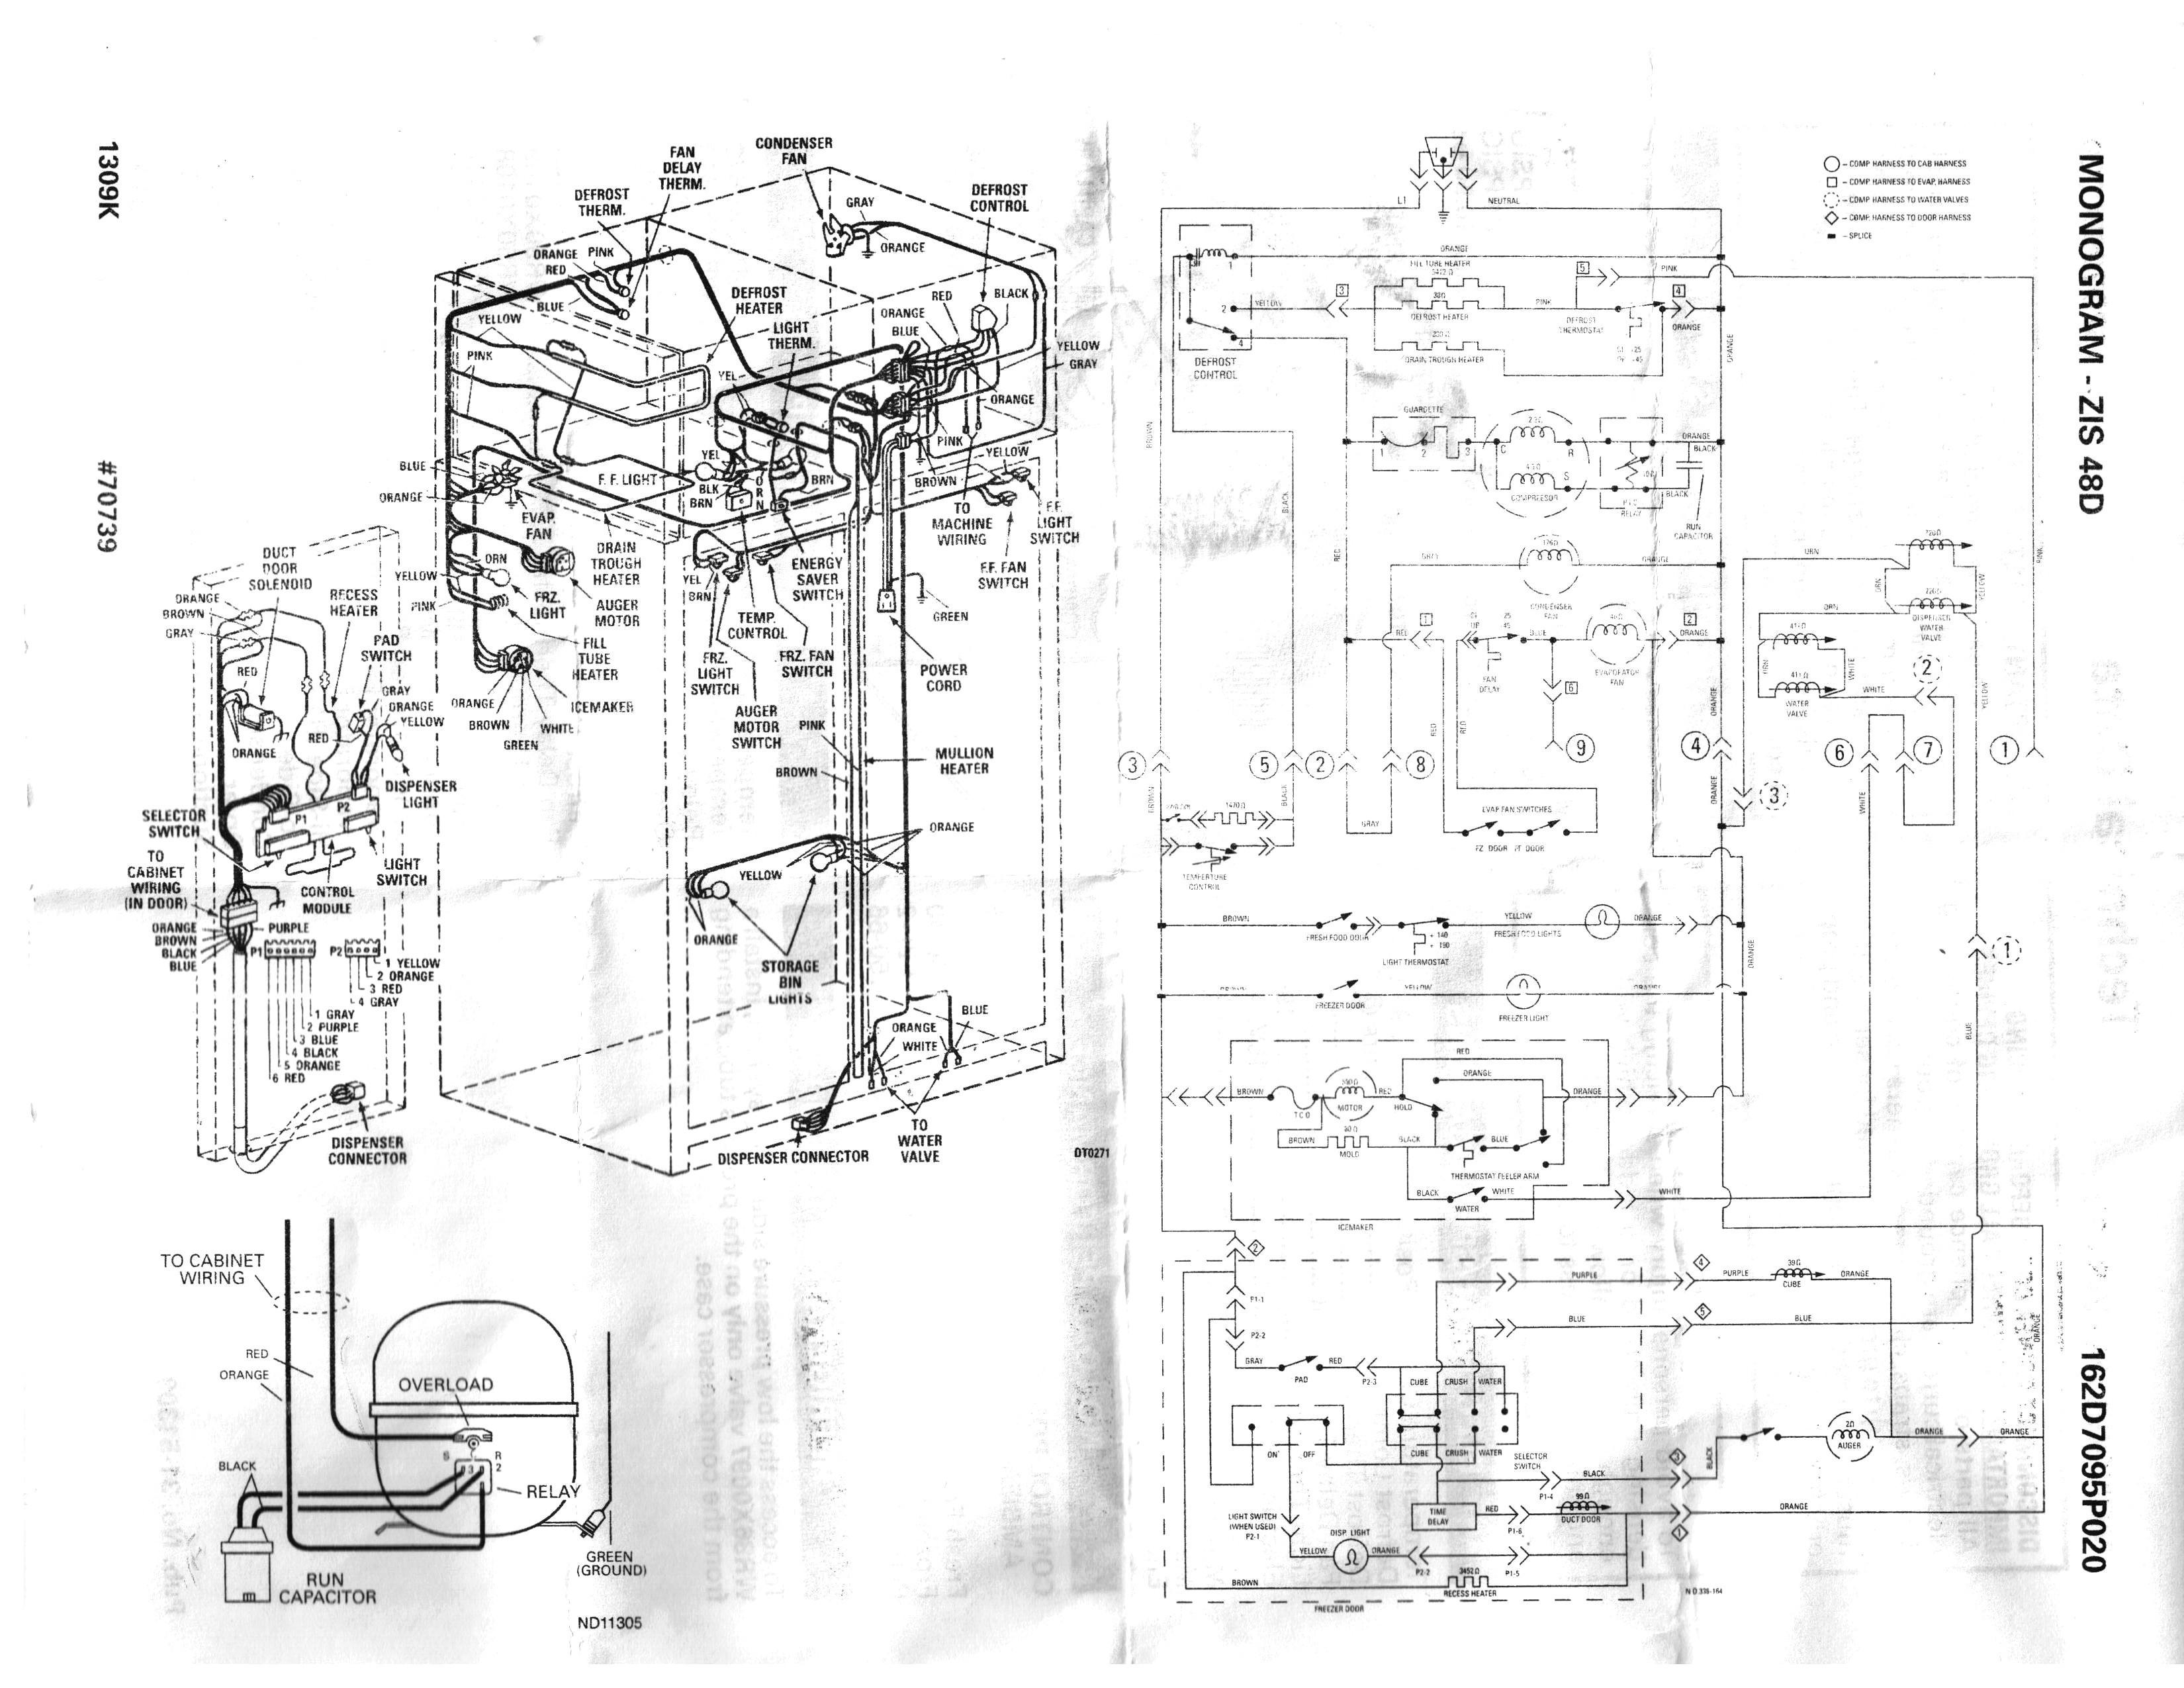 Ge Icemaker Wiring Diagram - Catalogue of Schemas on